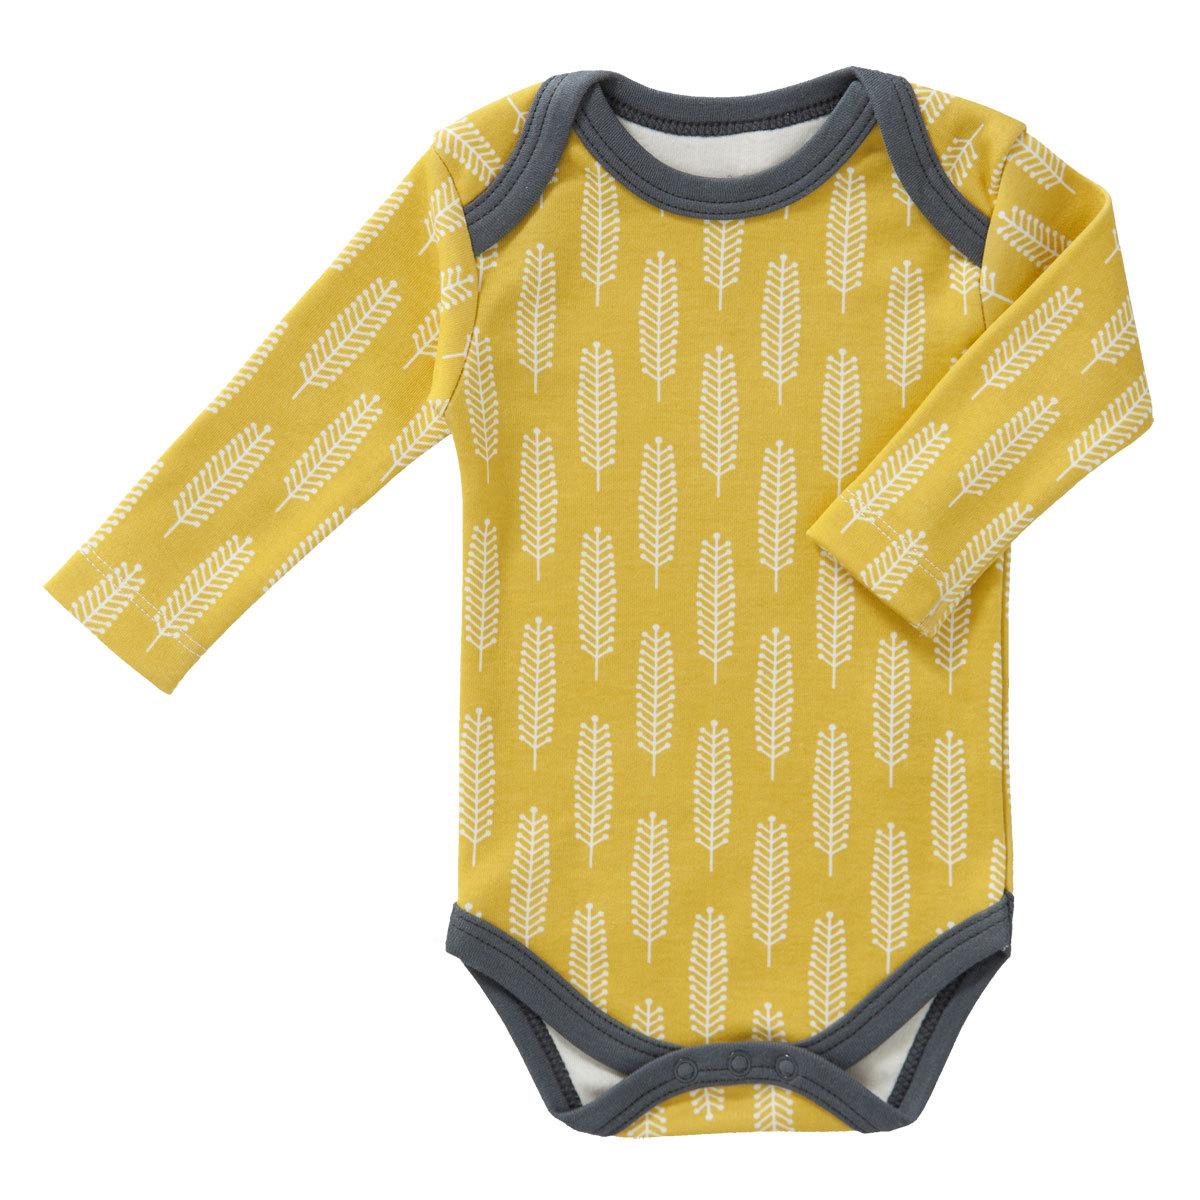 ca64d17a8890a Body   Pyjama Body Manche Longue Plume - Vintage Yellow - 0   3 mois Body